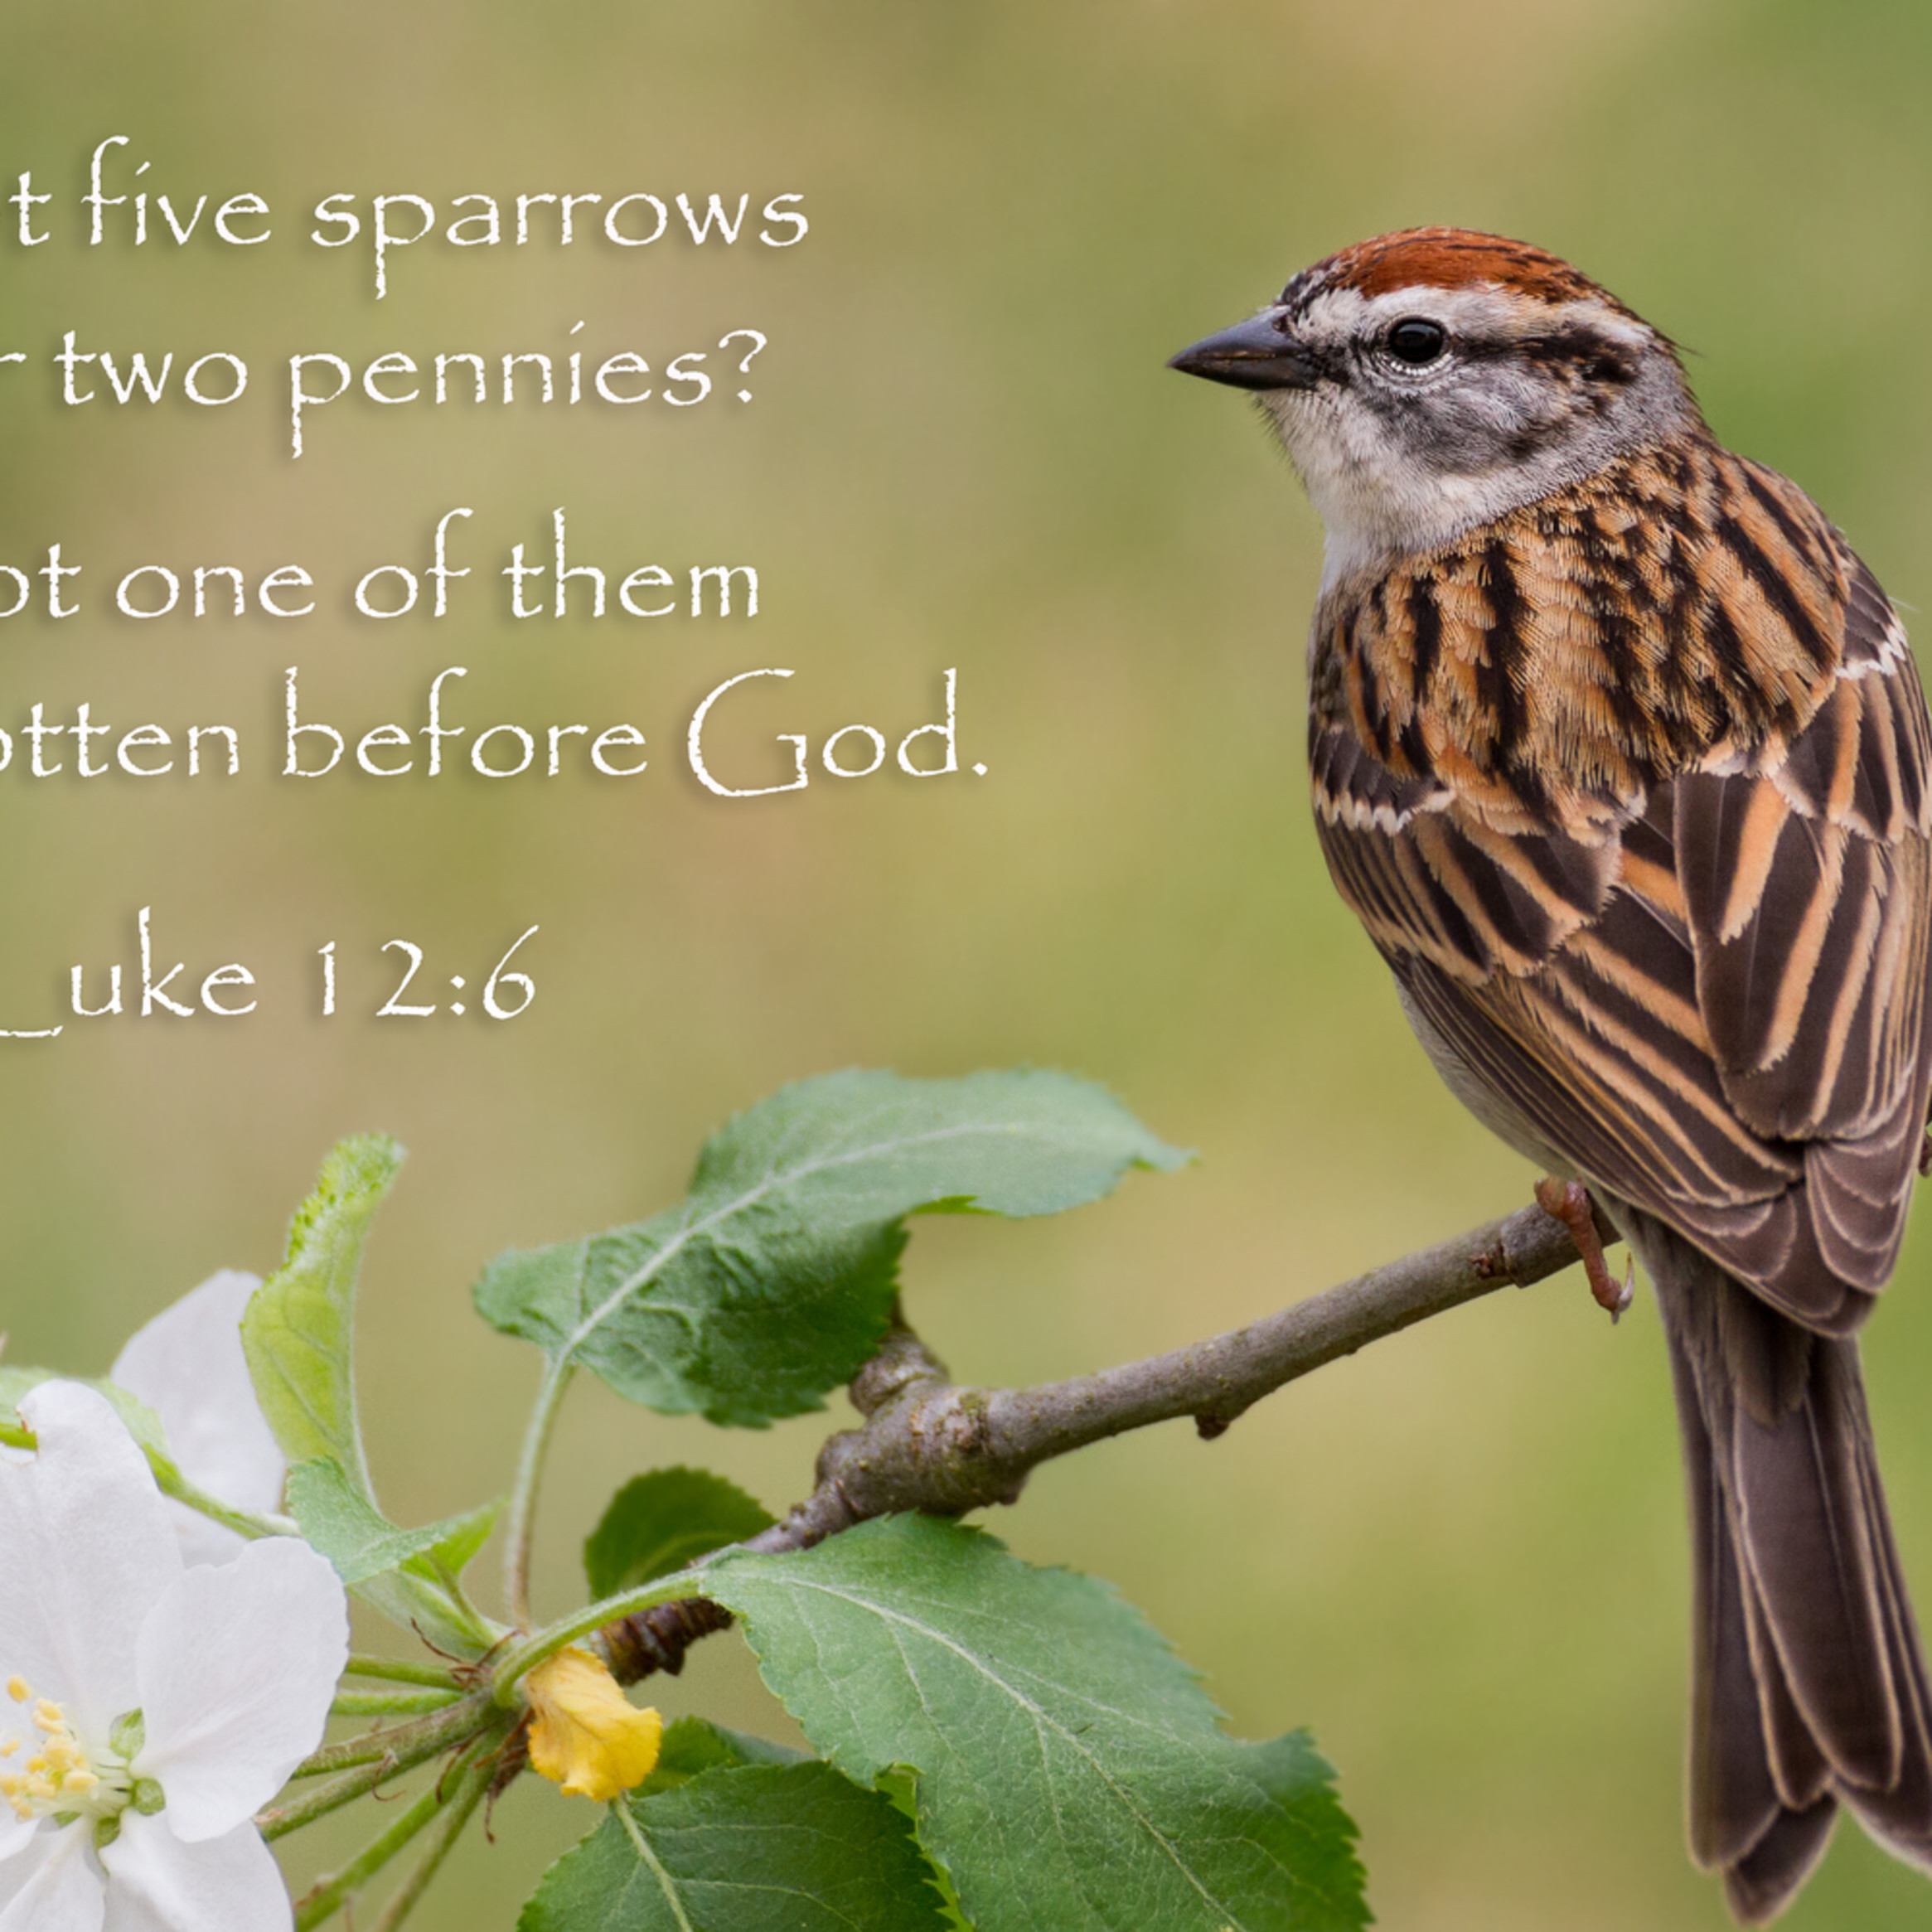 Sparrowverse  qta1ij